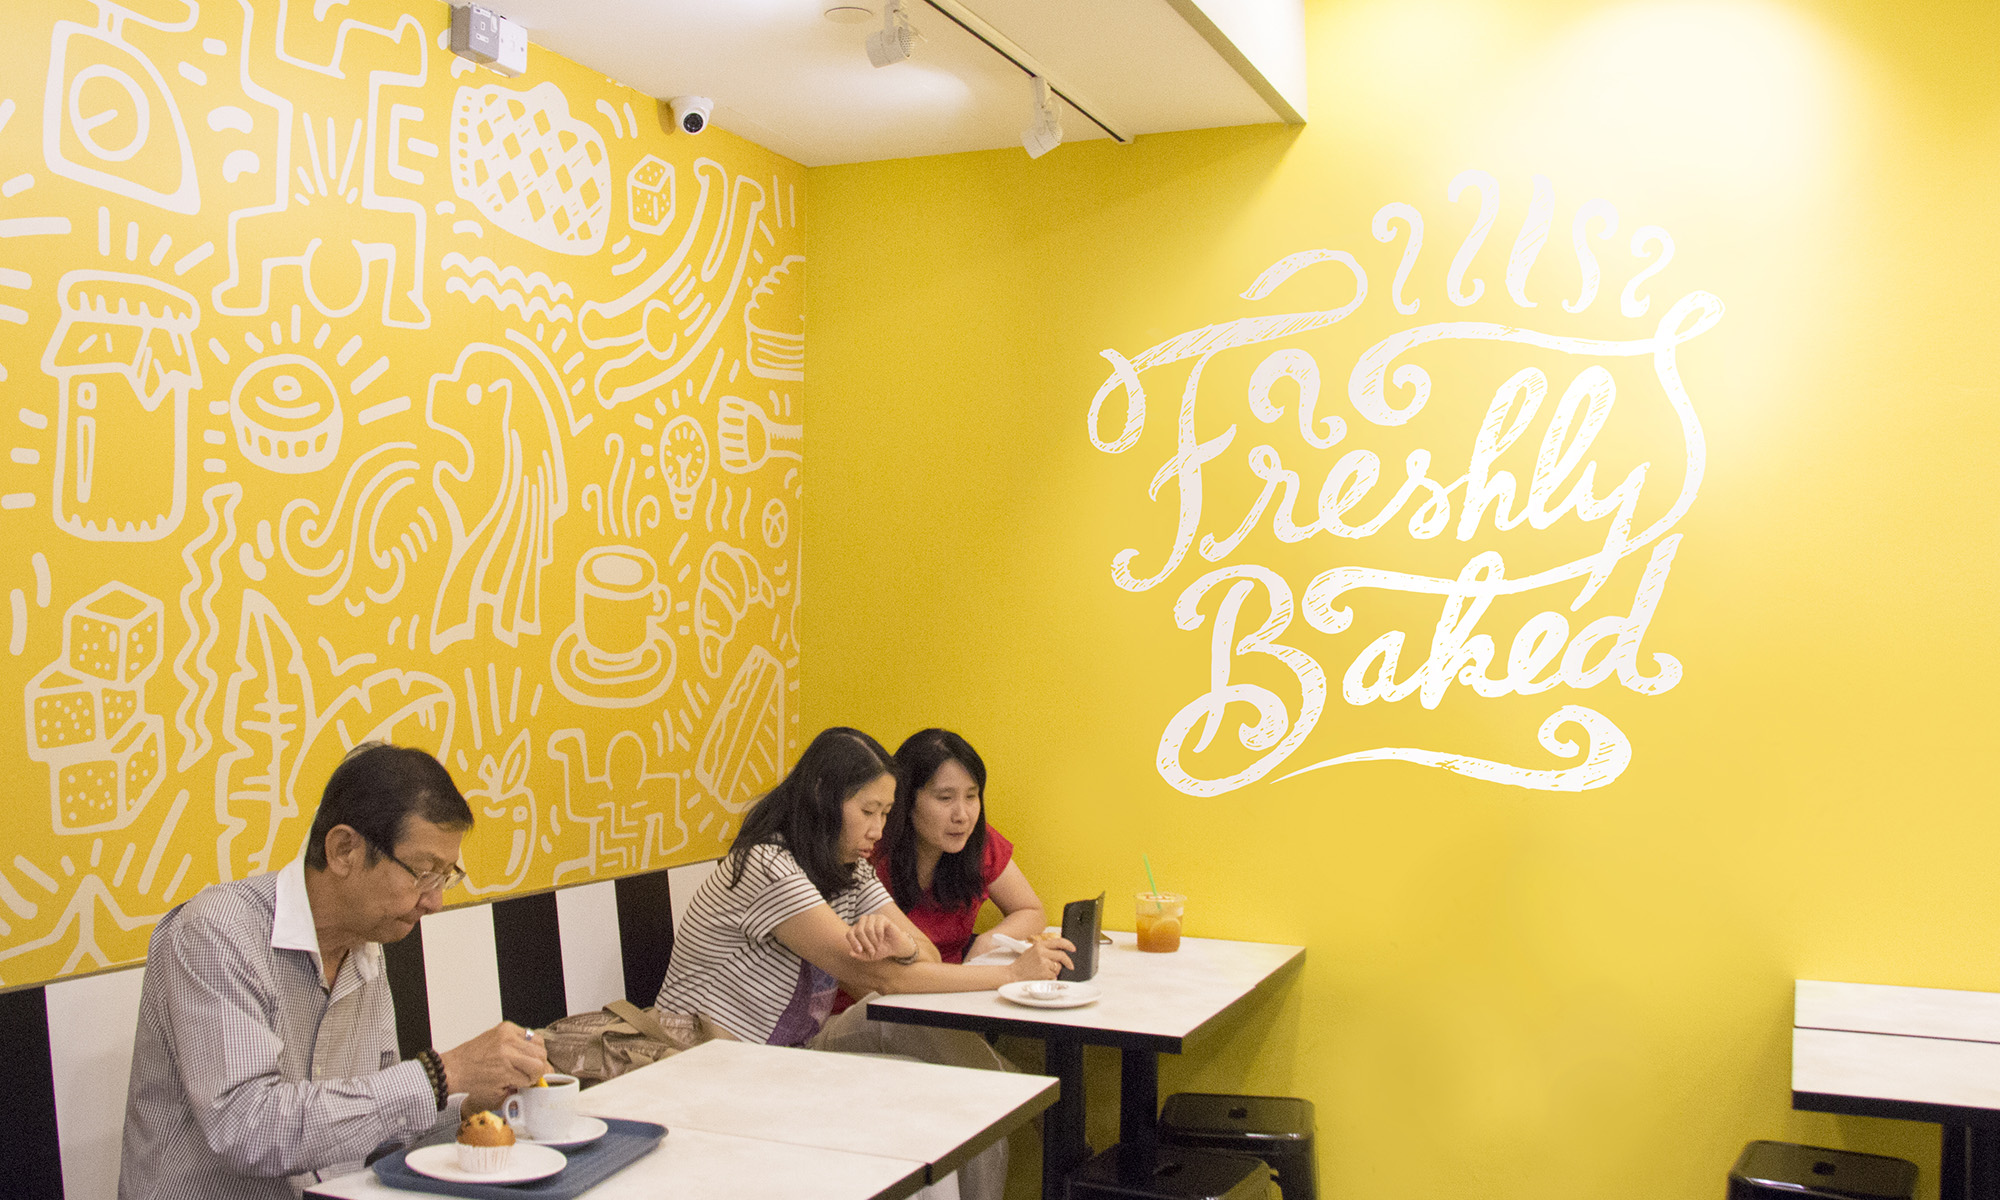 Mayson-bakery-singapore-mural-art-2